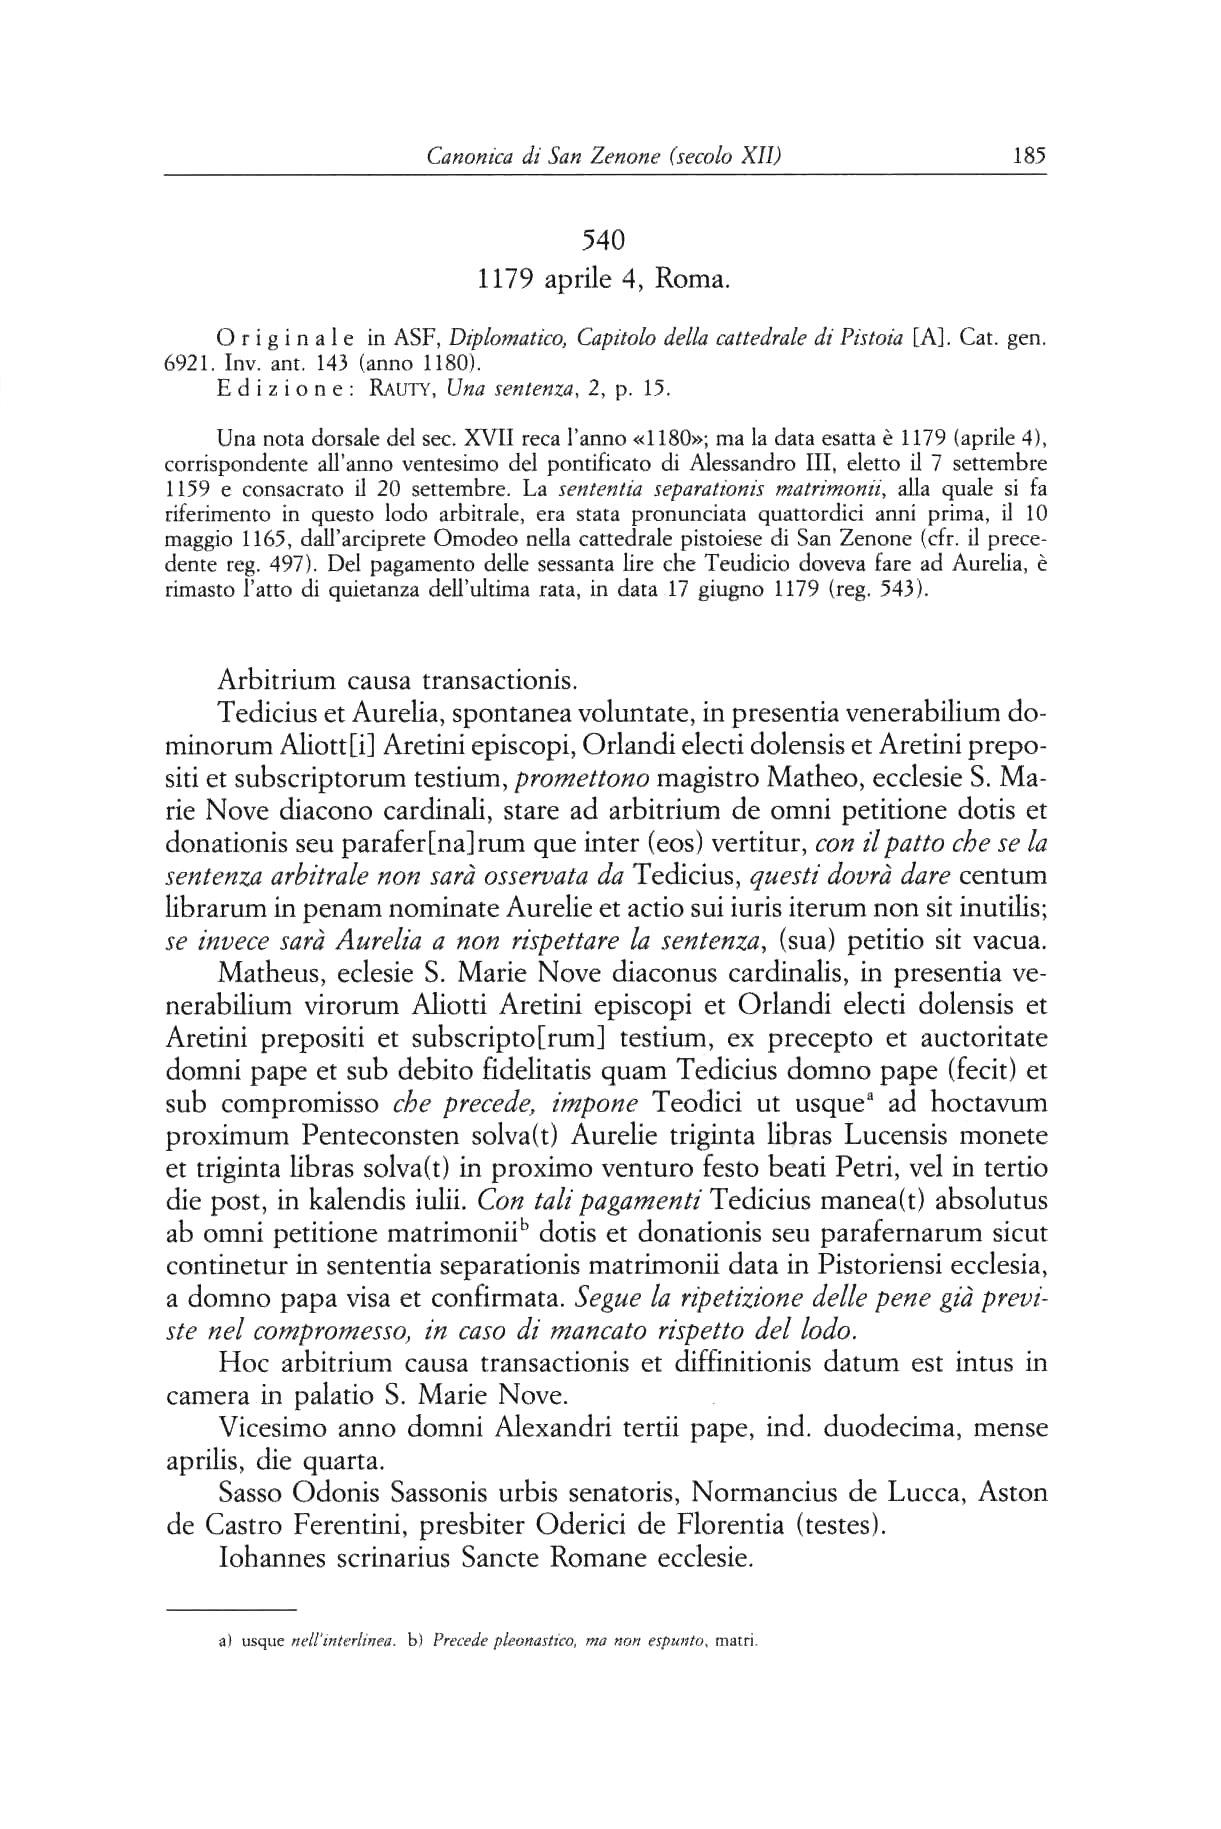 Canonica S. Zenone XII 0185.jpg